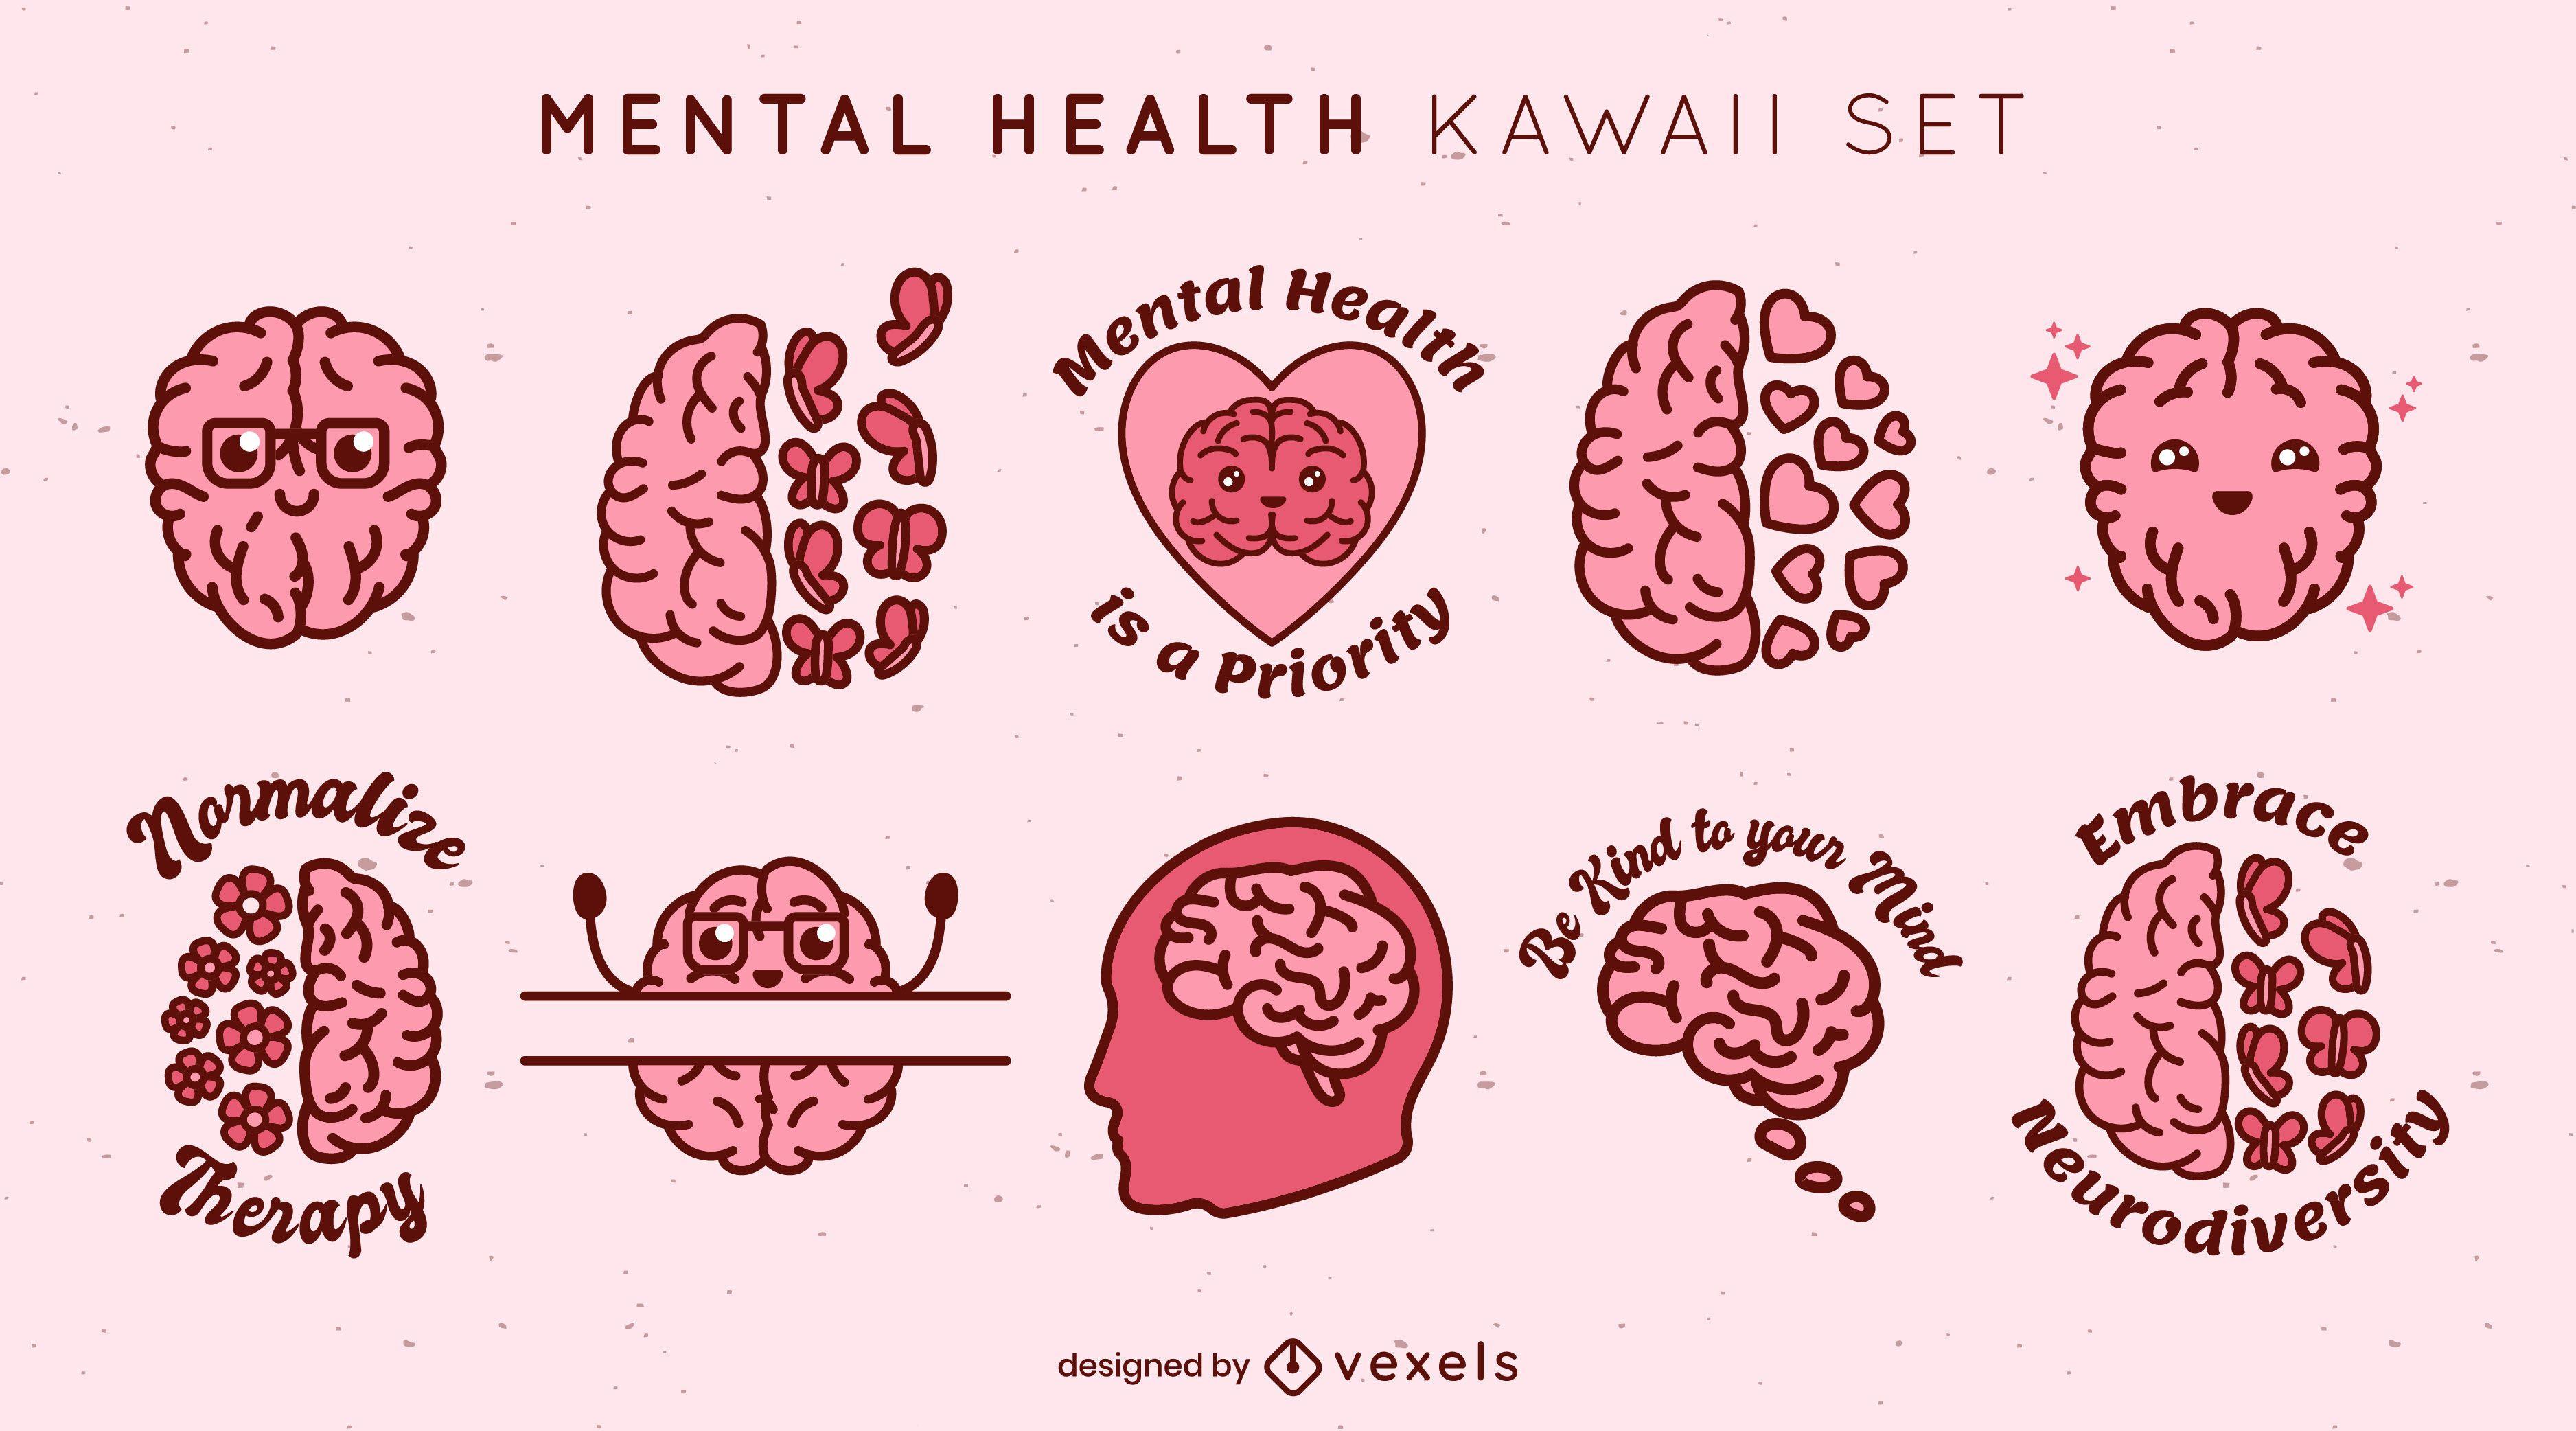 Mental health kawaii set of elements